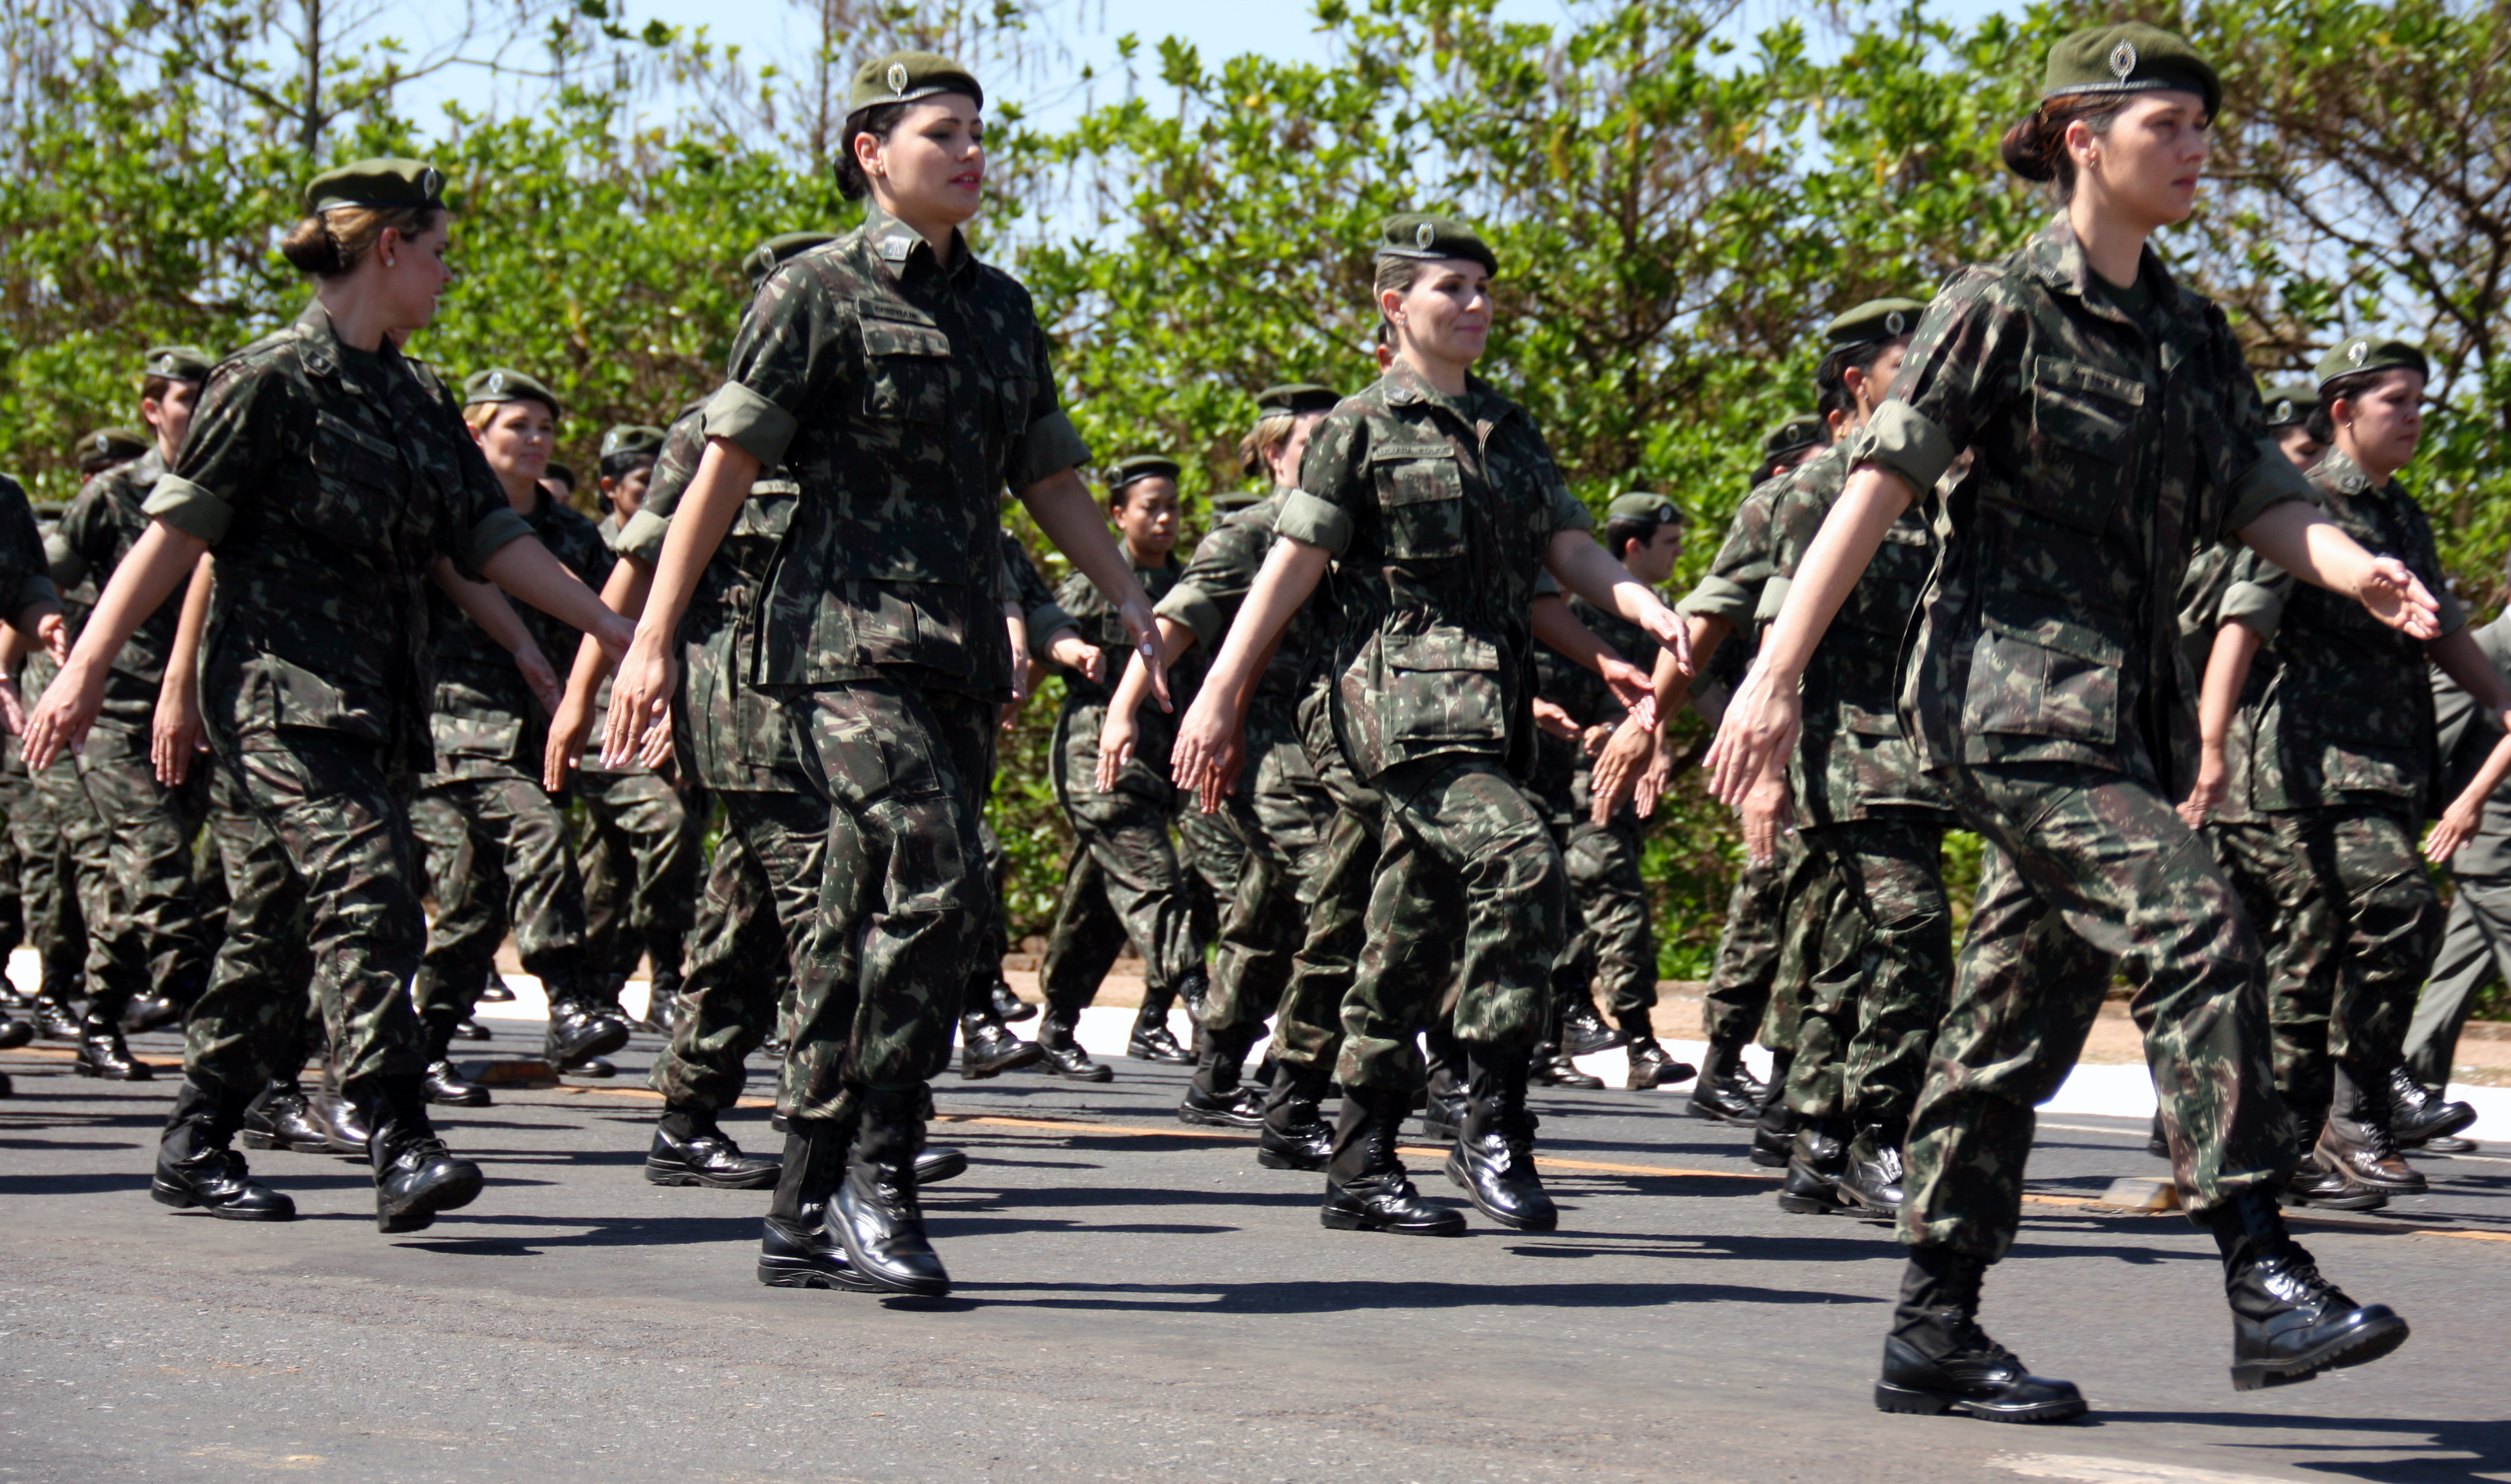 50f06b634d1d5 Mulheres do exército brasileiro marchando.